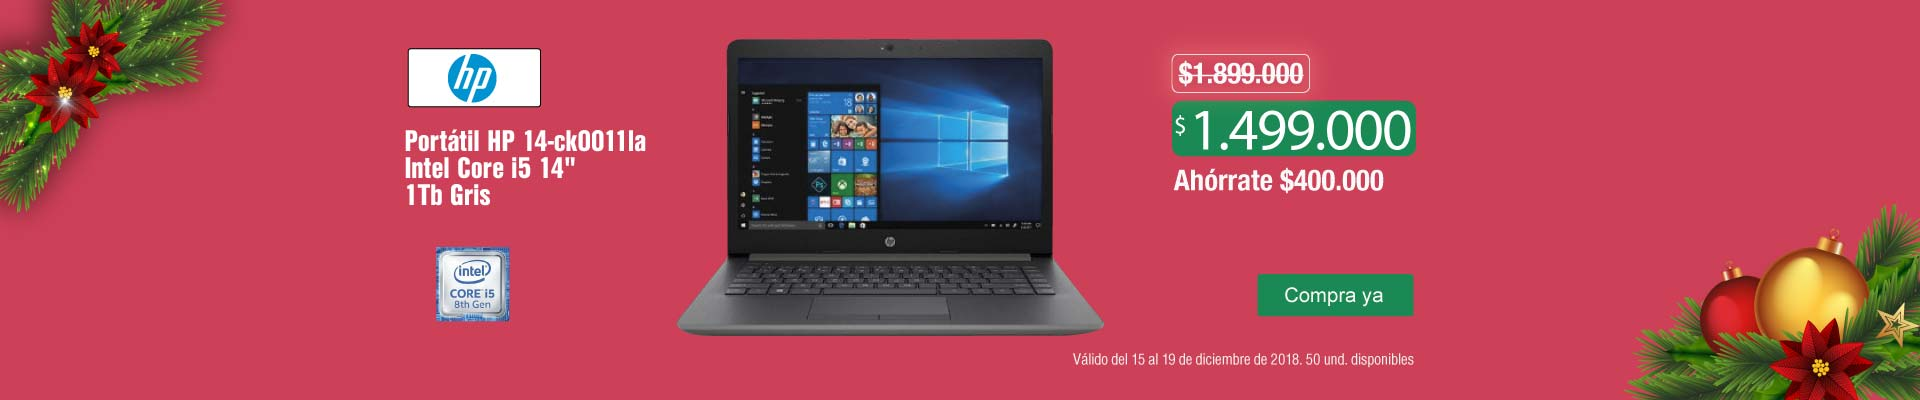 AK-CYBERSANTA-PPAL-4-computadores y tablets-PP---HP-Portátil 14-ck0011la-dic17